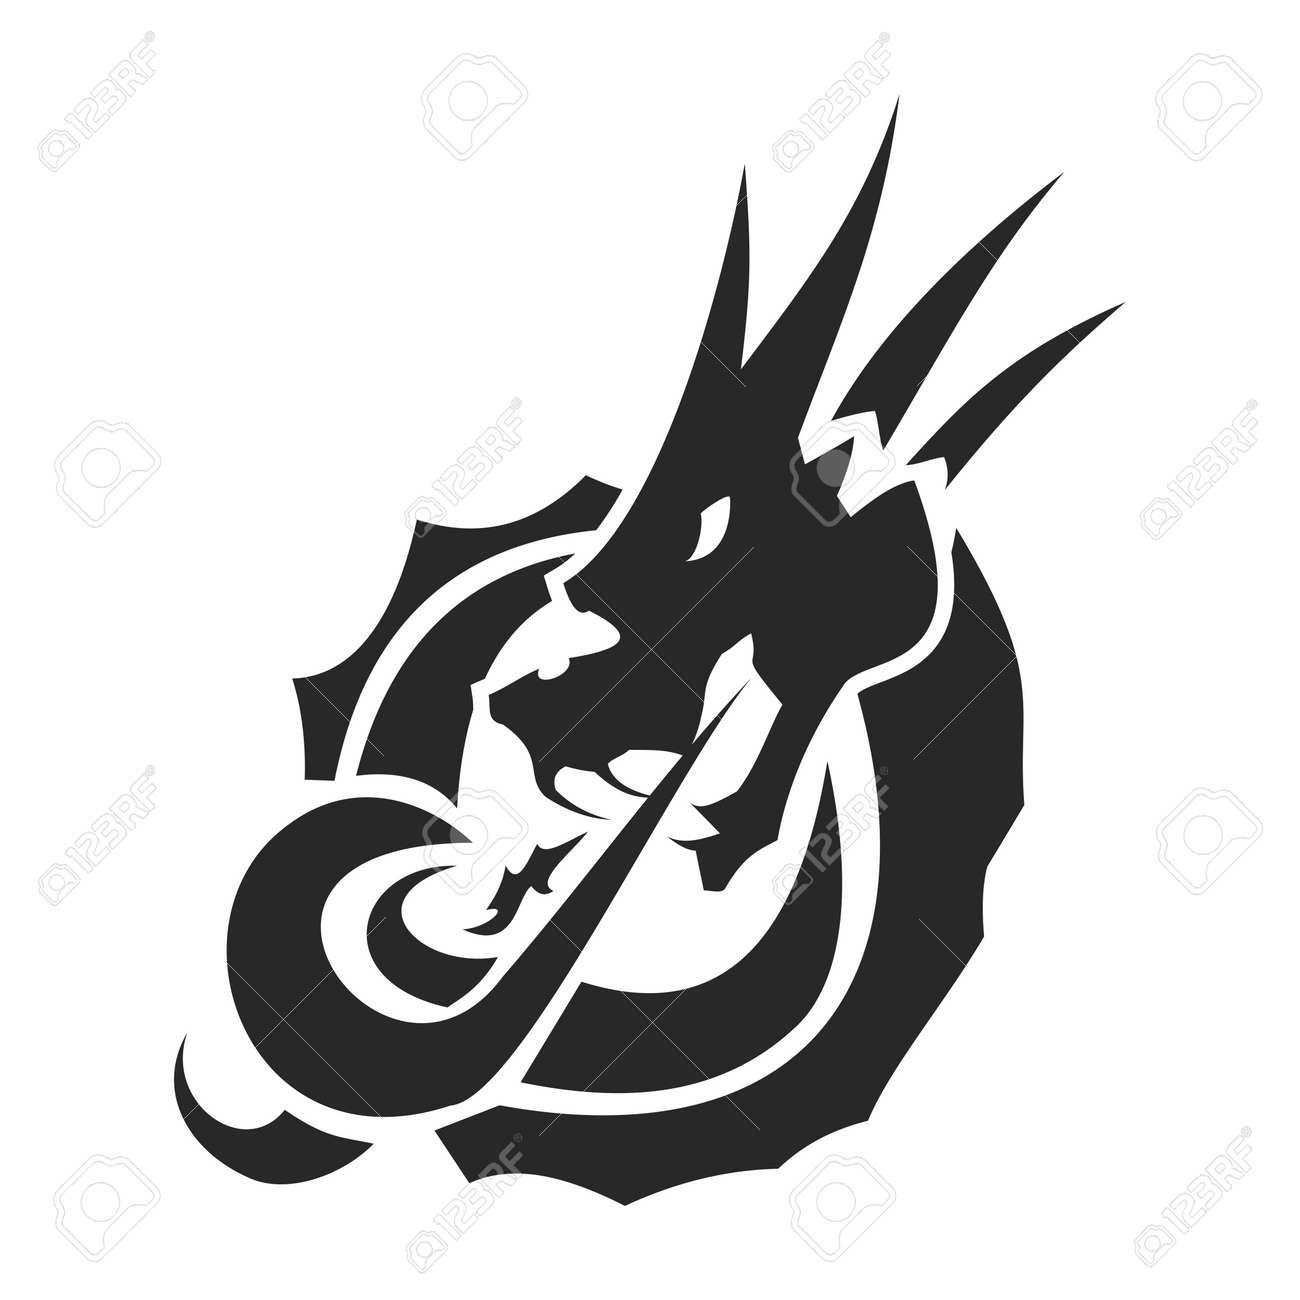 vector monochrome artistic dragon emblem logo fire breathing